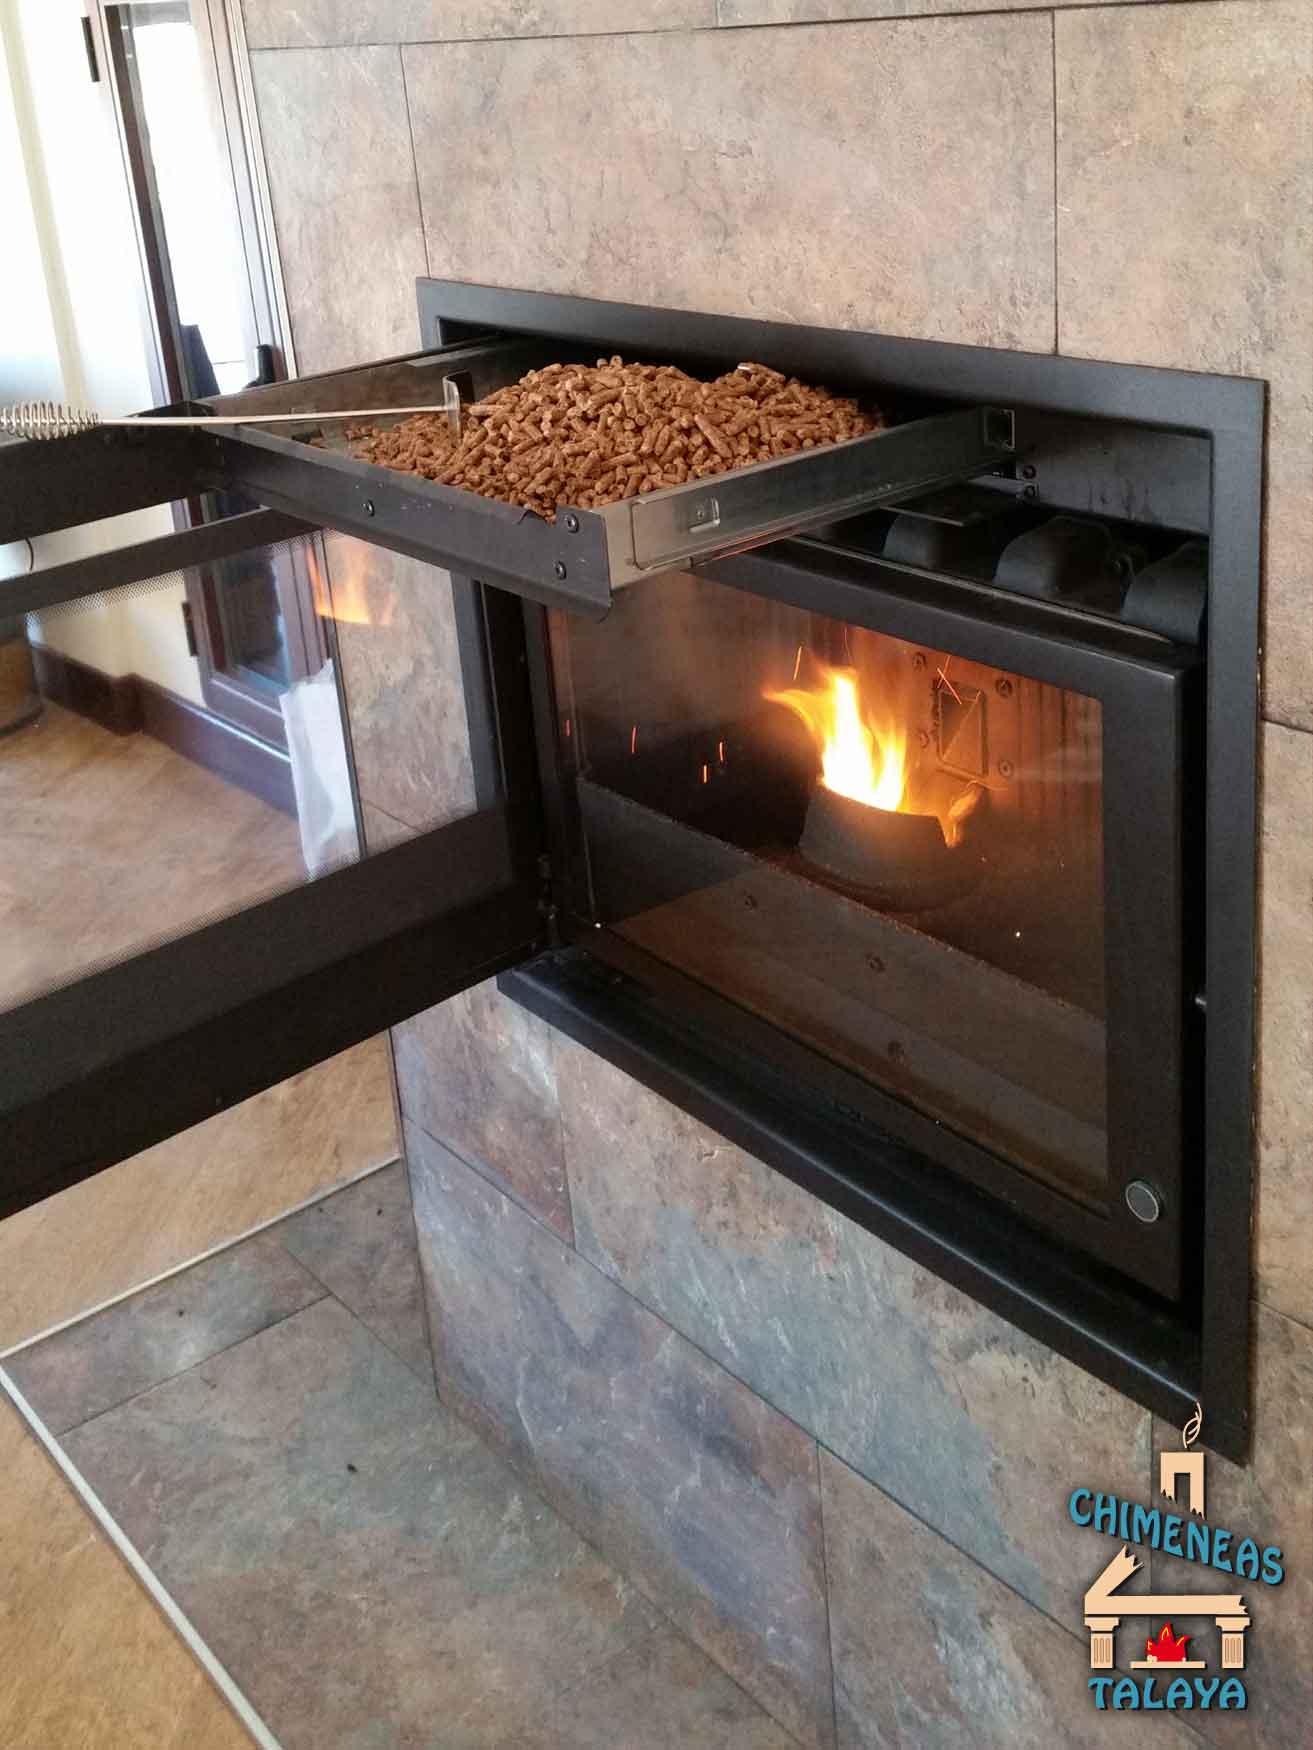 Chimeneas abiertas sistemas de calefacci n biomasa - Chimeneas de peles ...